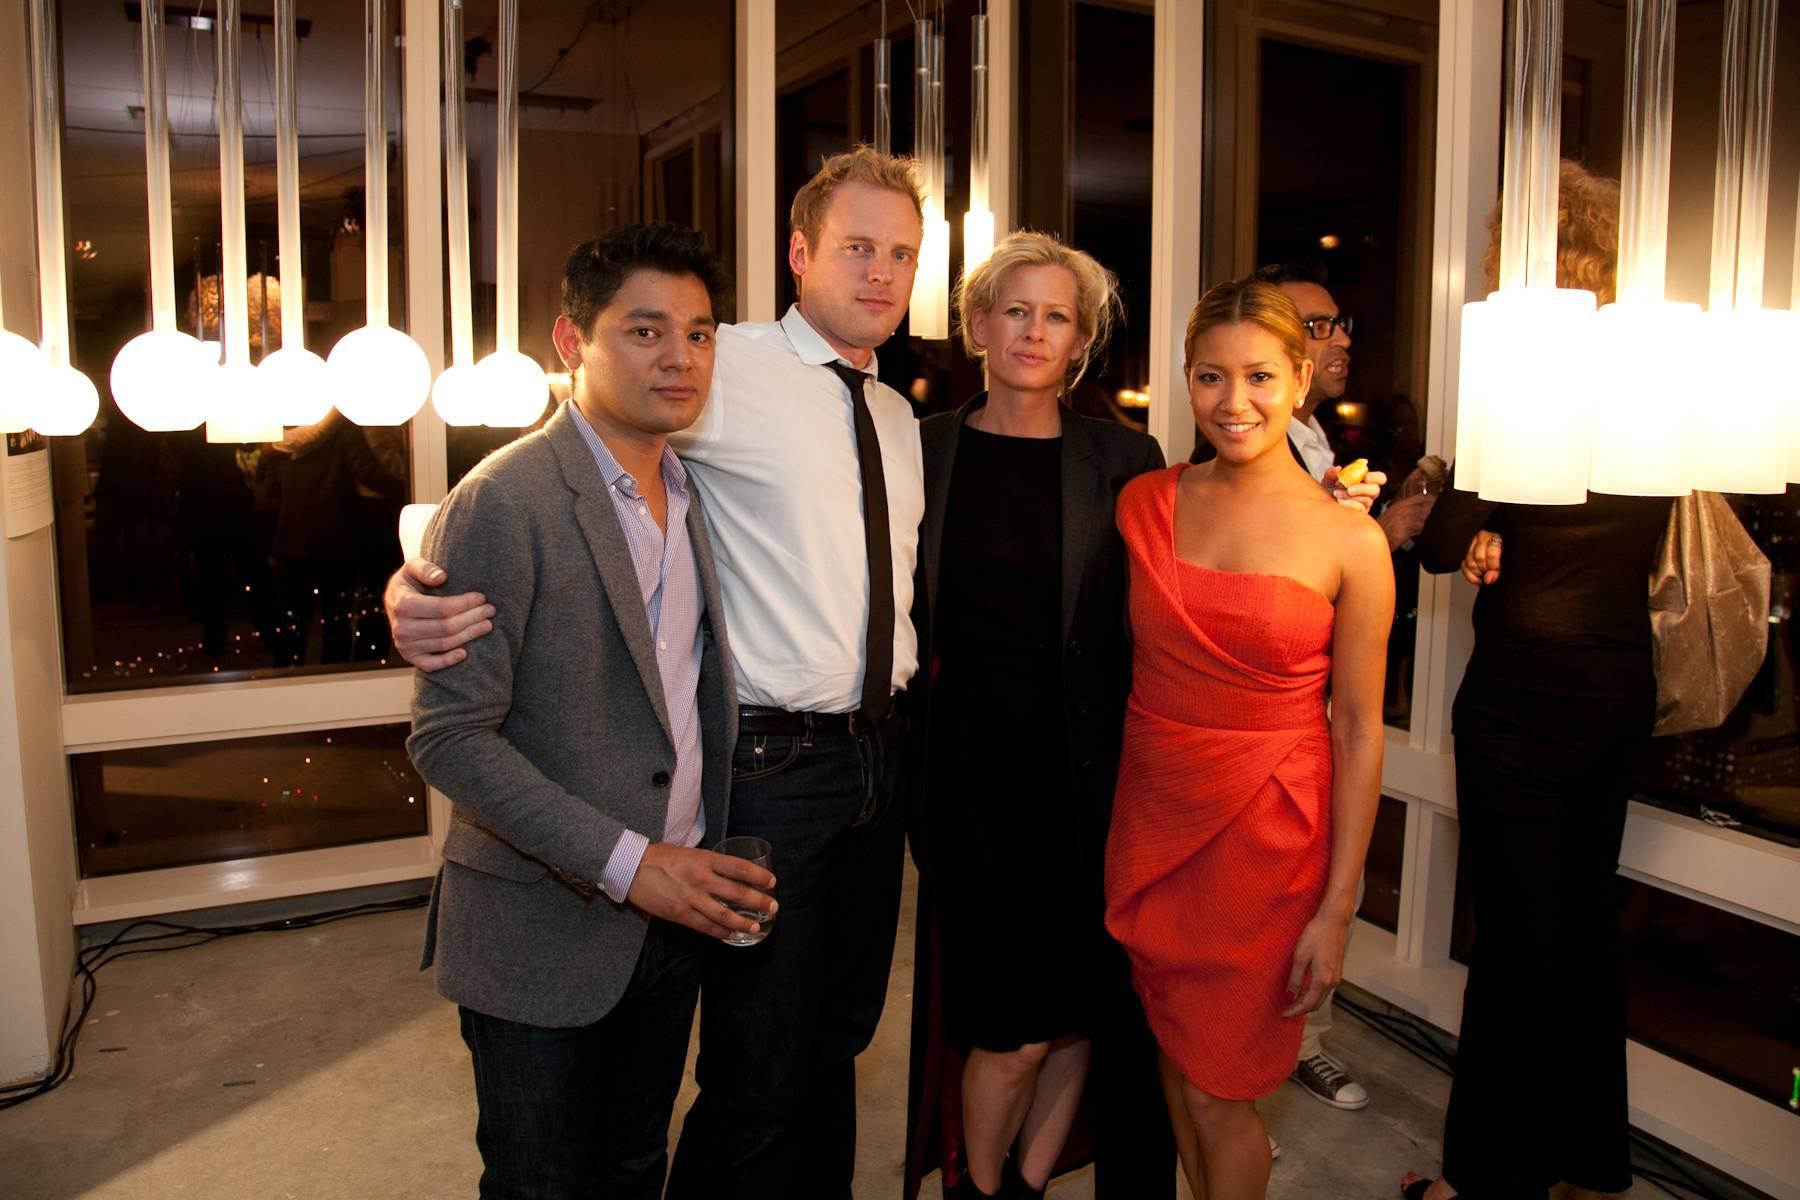 Designer Larissa Sand, JLSF Chair Lillian Phan and friends